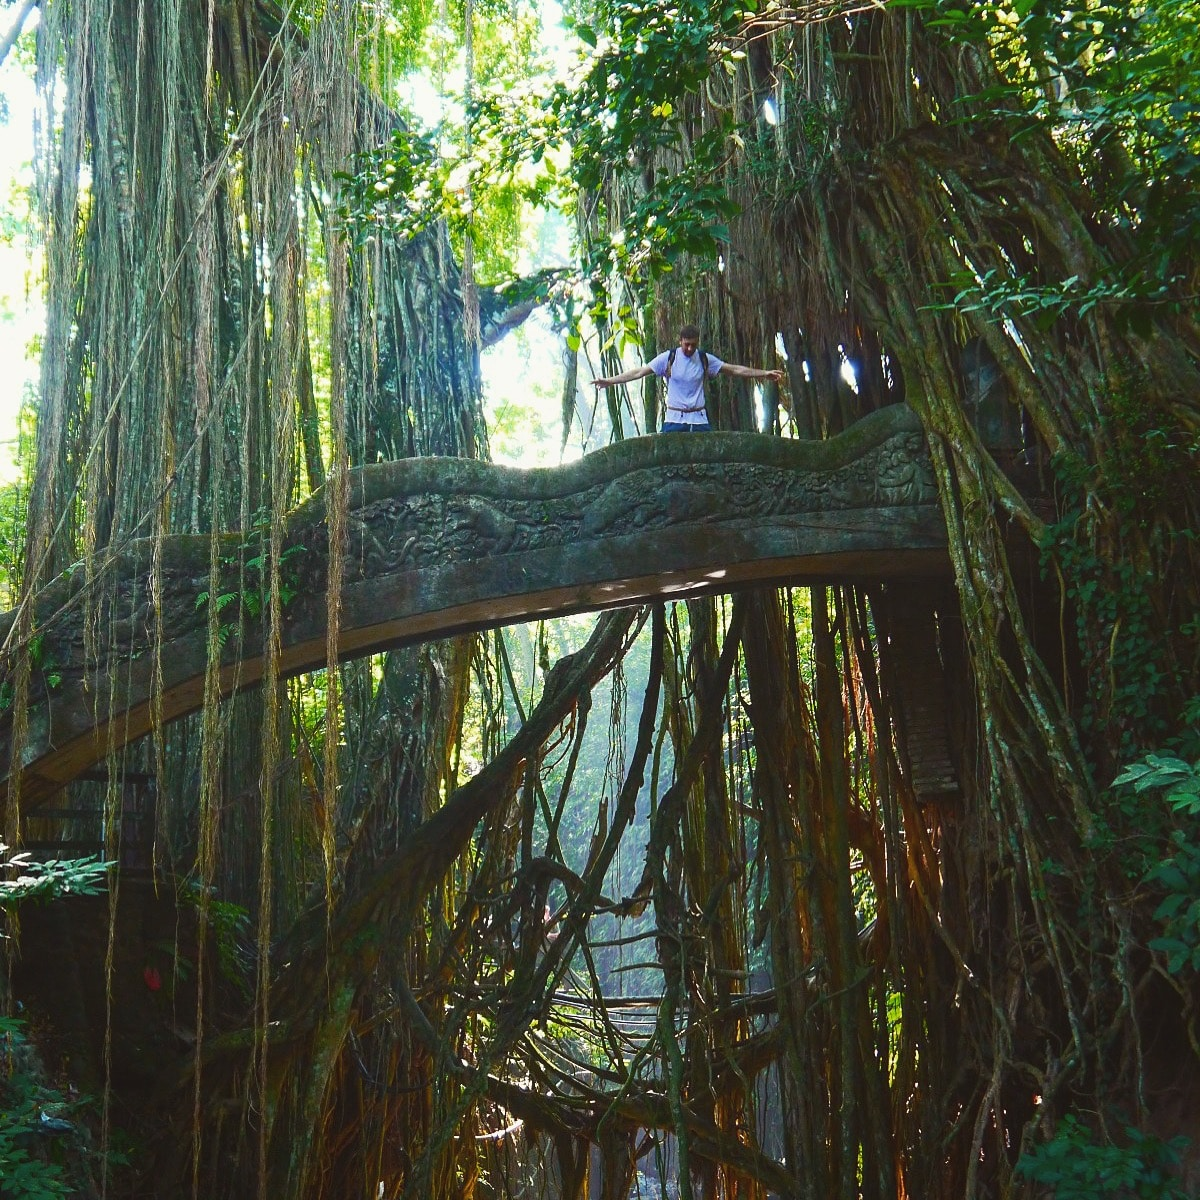 monkey forest bali, ubud bali monkey forest,monkey forest bali cost,ubud monkey forest bali ,sacred monkey forest bali ,bali ubud monkey forest ,monkey forest bali ubud,bali monkey forest ubud,monkey forest bali entrance fee, things to do in ubud, best things to do in ubud, top things to do in ubud, things to do in ubud bali, things to do in ubud at night, things to do in ubud blog, free things to do in ubud, things to do in ubud shopping, things to do in ubud tripadvisor, things to do in ubud centre